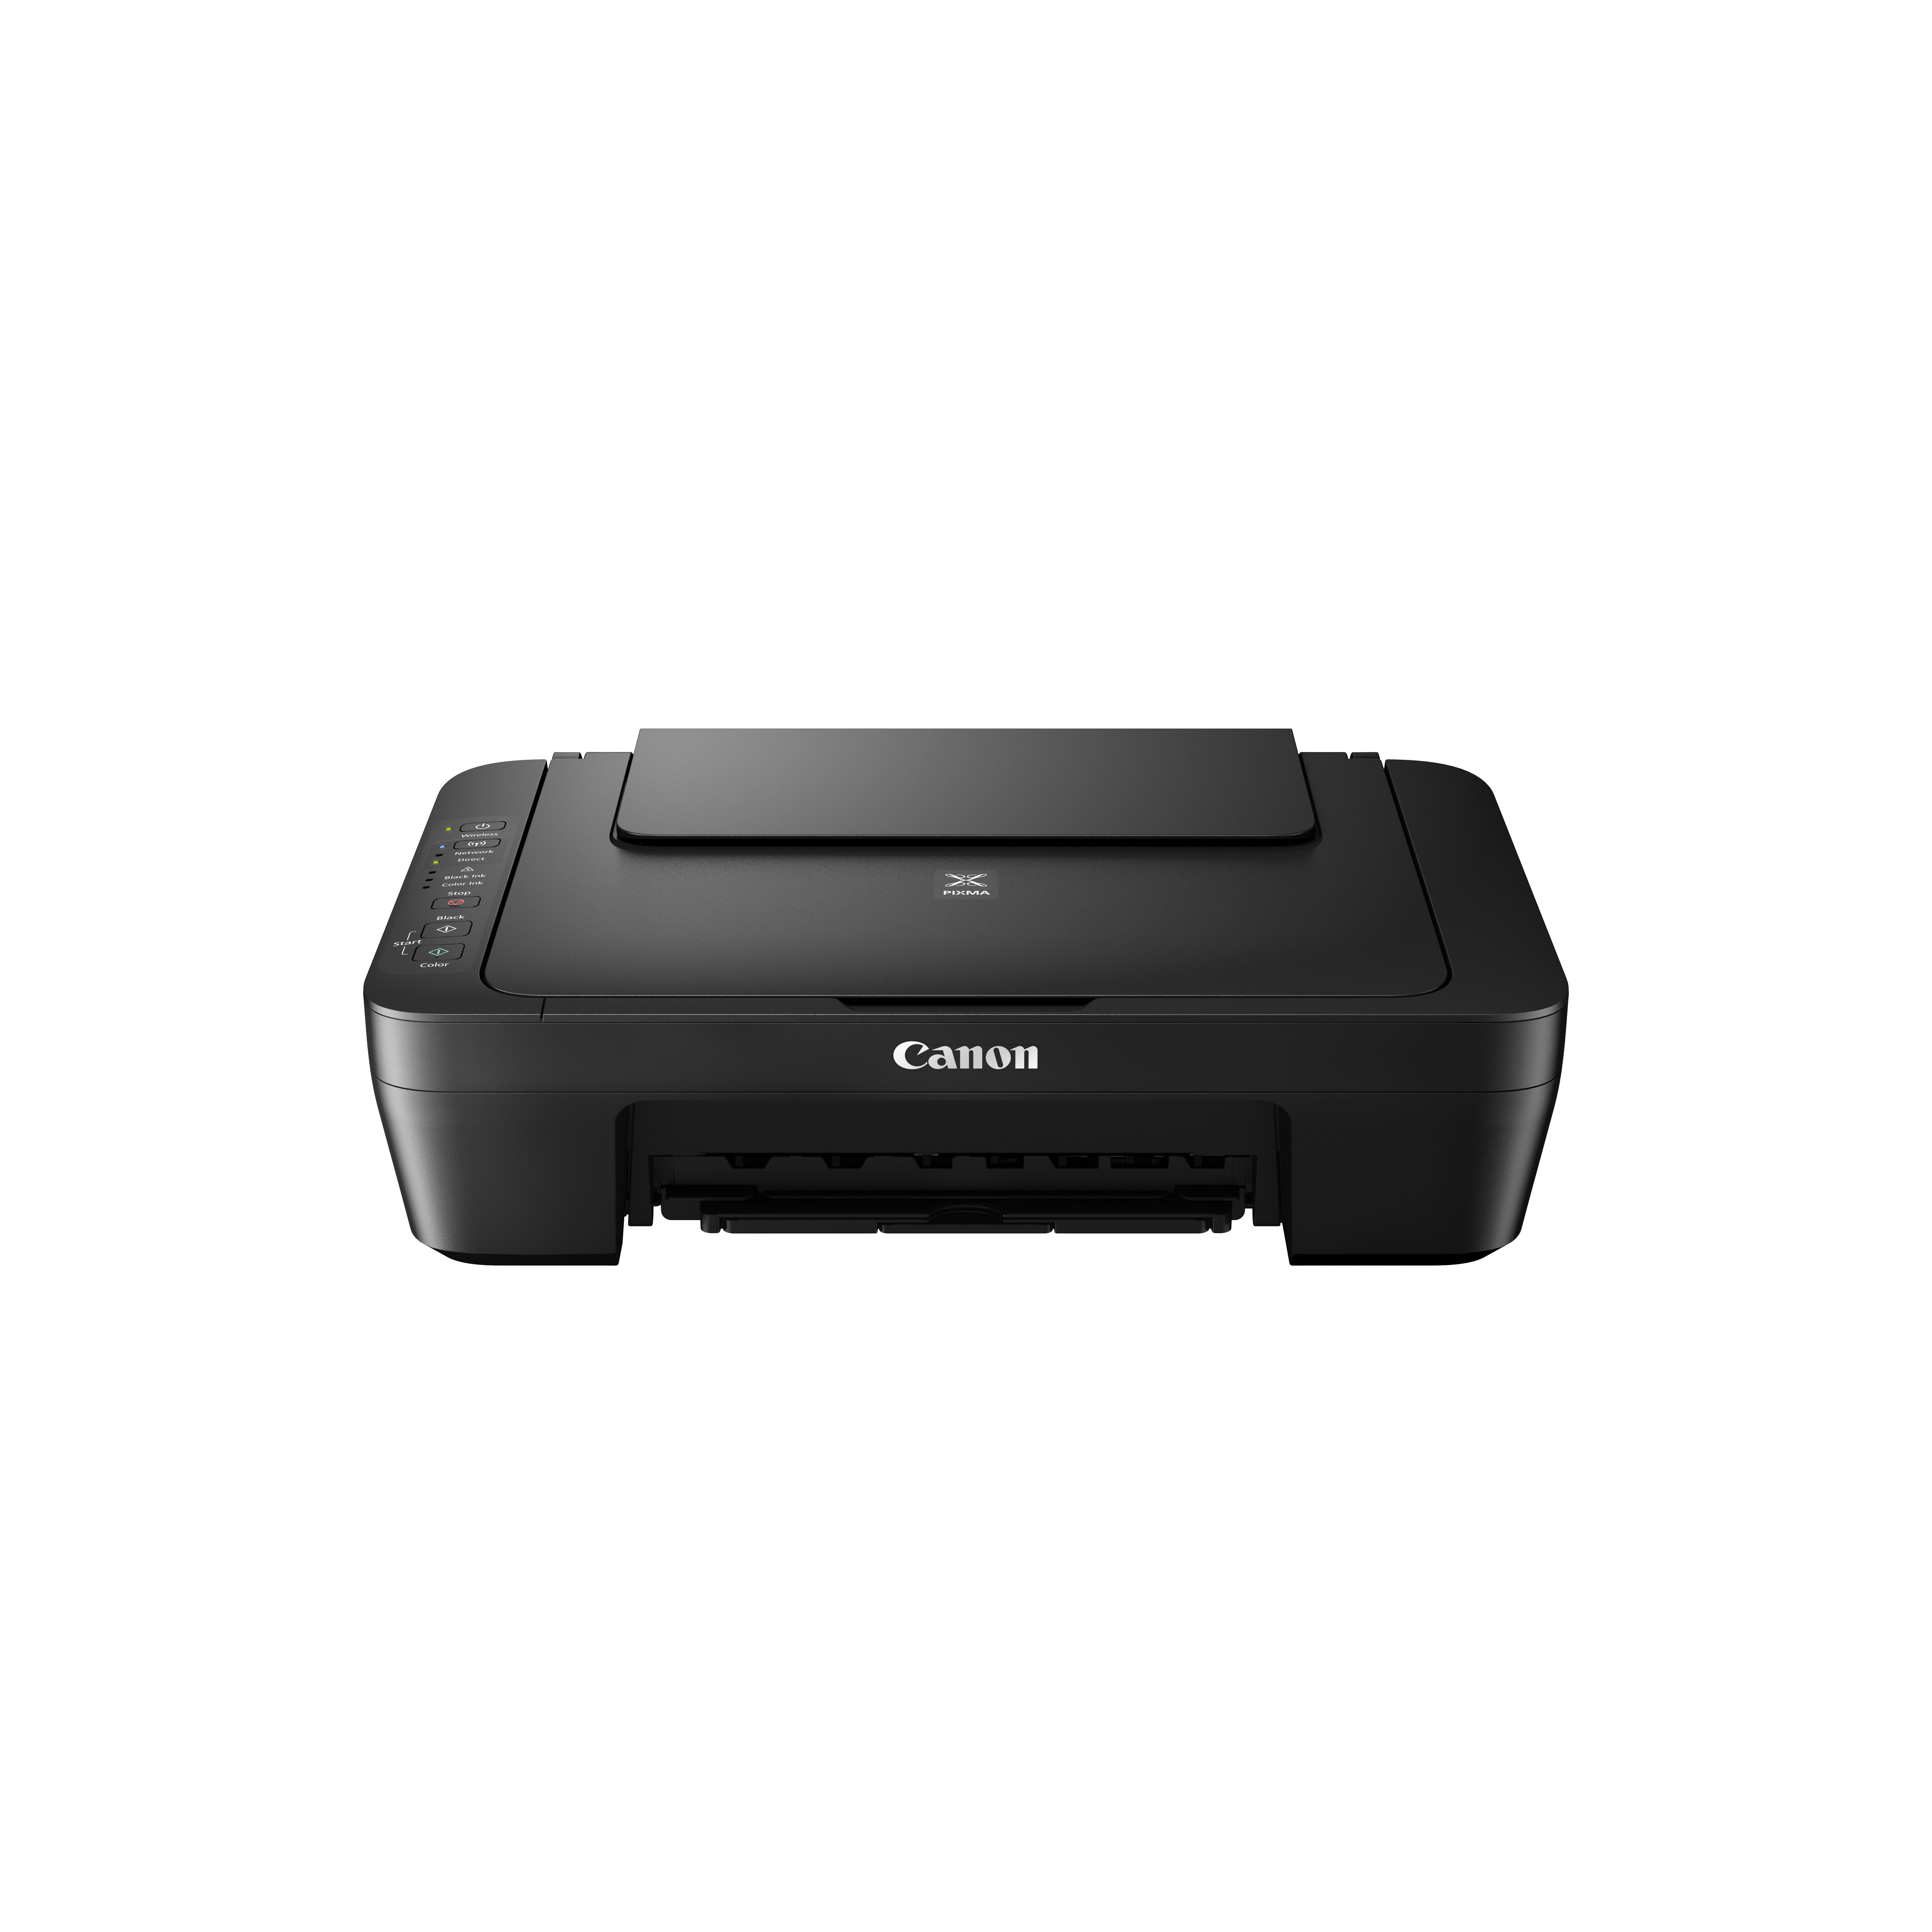 Canon PIXMA MG3050 - Multifunktionsdrucker - Farbe